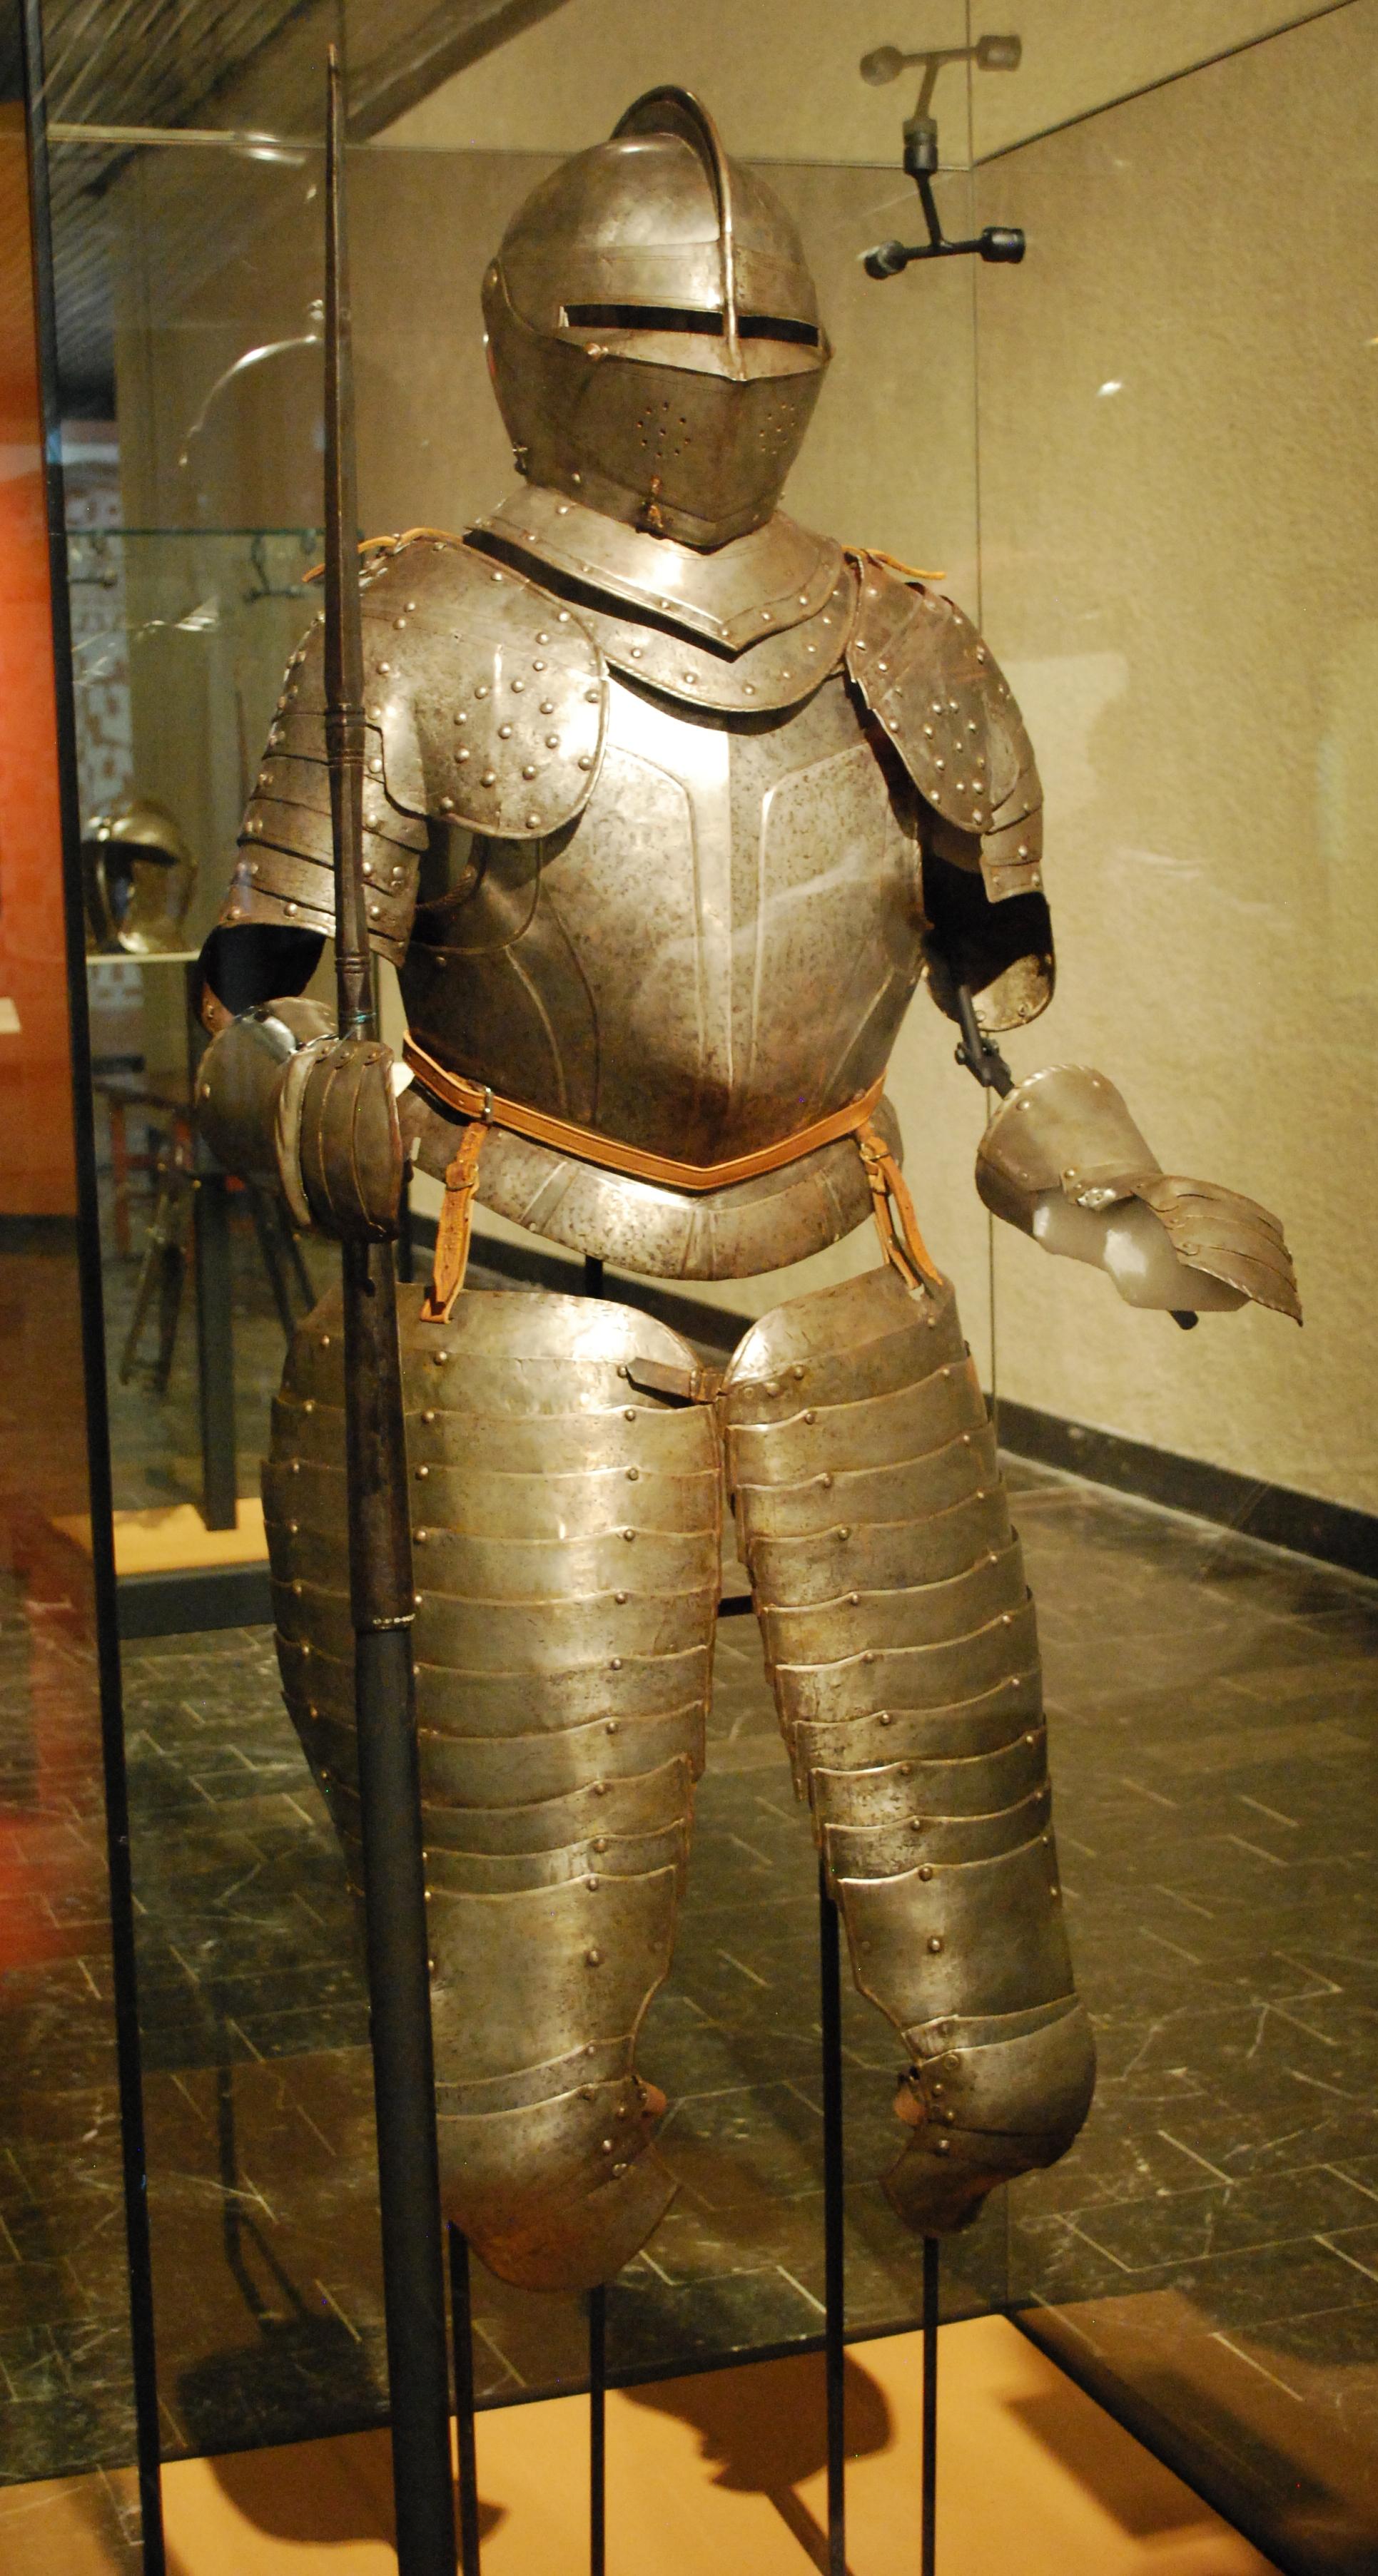 Amerigo Vespucci's Armor Plate